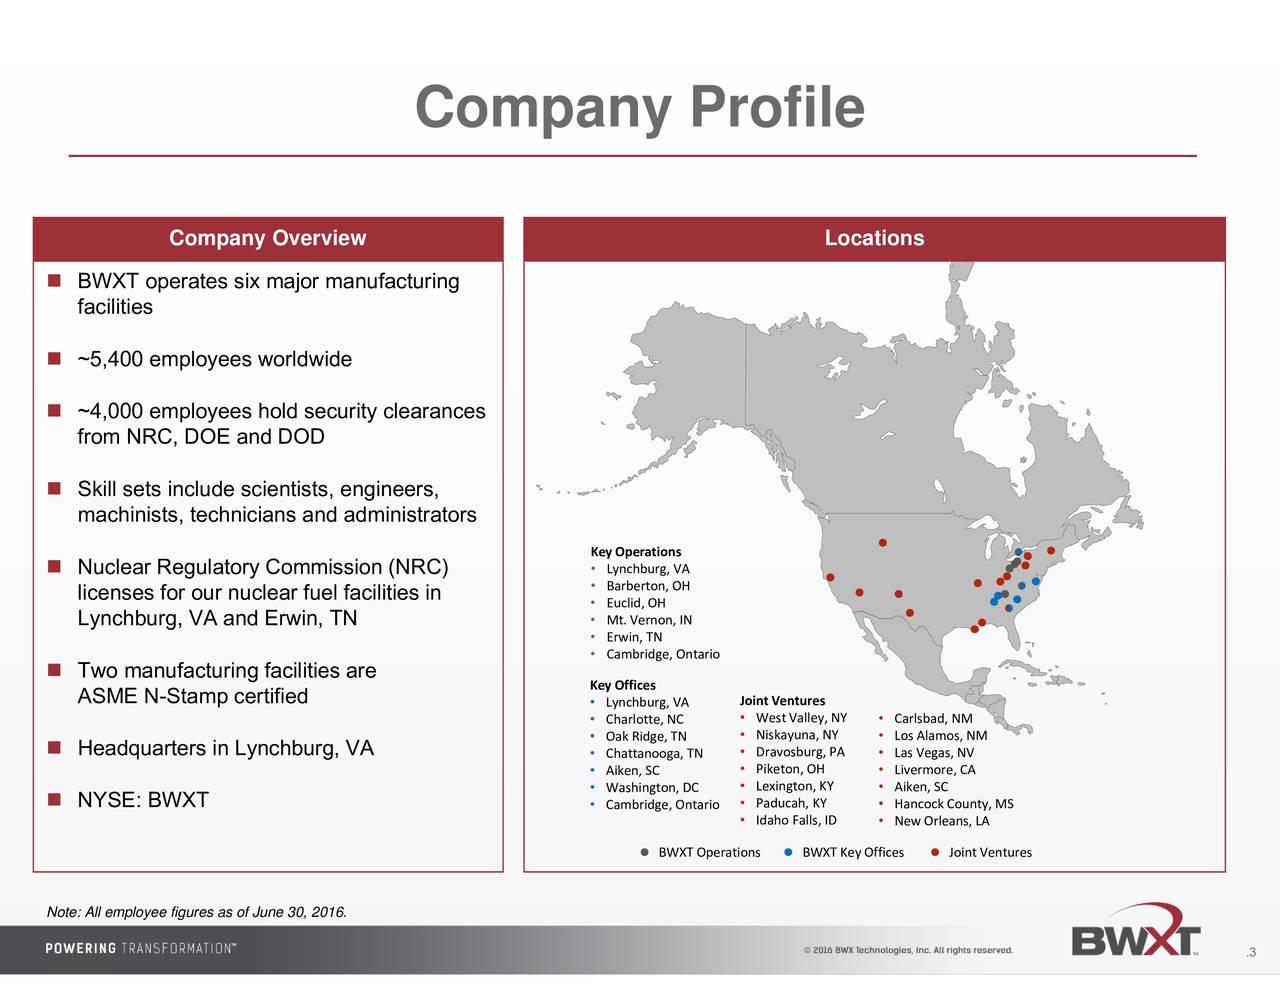 MS LA entures MNVA M  ounty,int C rleans, legas, Carlsbad,keaec,ock Offices Y A ey Locations Y YYD Valley,H alls,T Ventures WestkrPiLeiducao, Jot Operations IN N C AH  ntarACN ntarBWXT H N C ernon, idge, pLychEult.,CambrLyncOaChaAWashigidng,e,, Key     Ke Company Profile Company Overview BW fXcTiteperat~04sr0mloSjkClsDeOudaaleetnehhiriyictaAeNolcaruiSilfscWltiTn)ihburg, VA Note: All employee figures as of June 30, 2016.